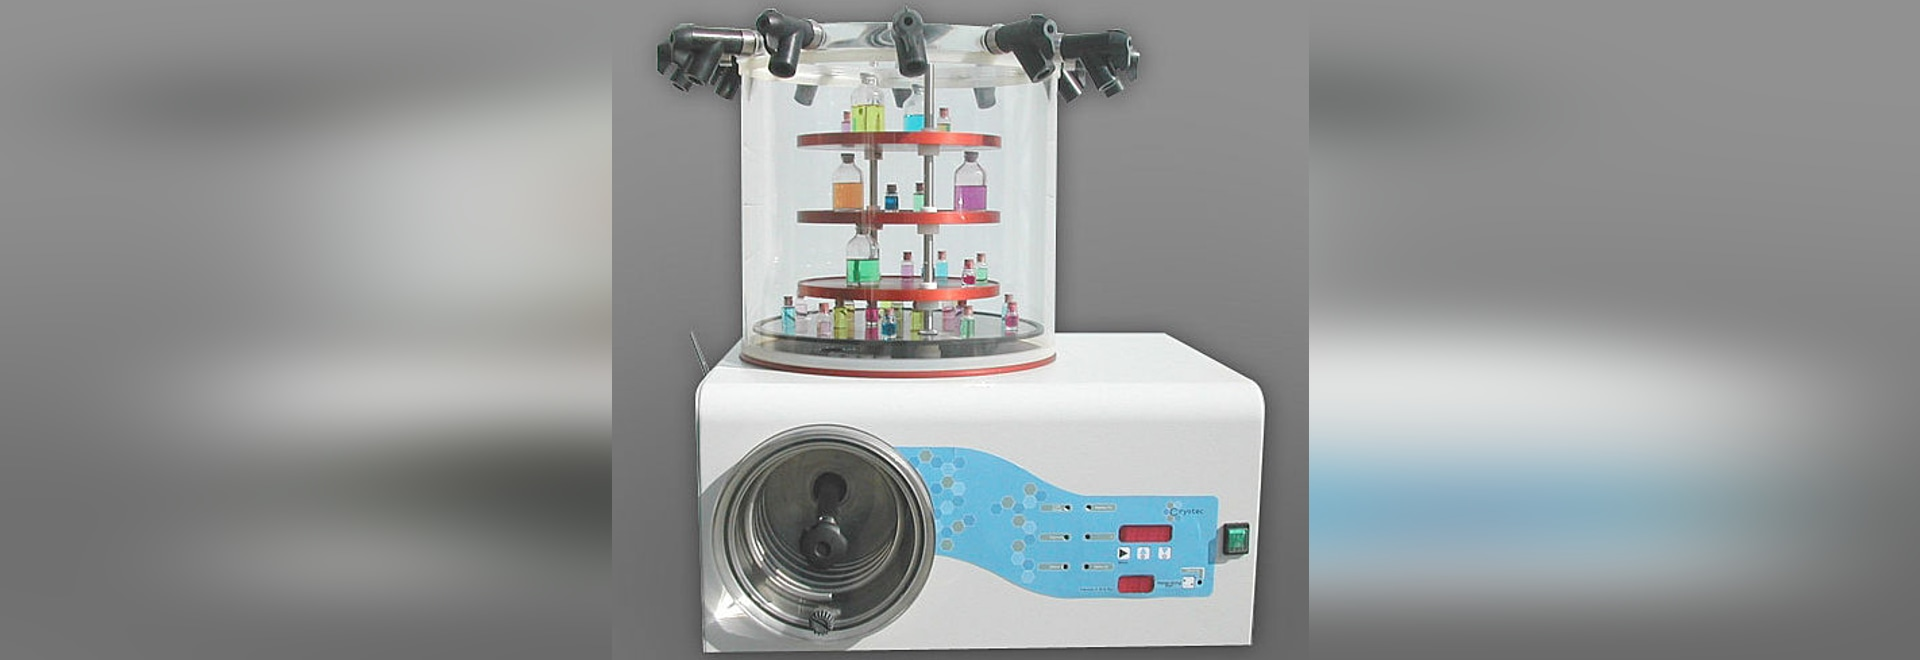 CRYOTEC - Laboratory freeze dryer Cosmos - Cryotec